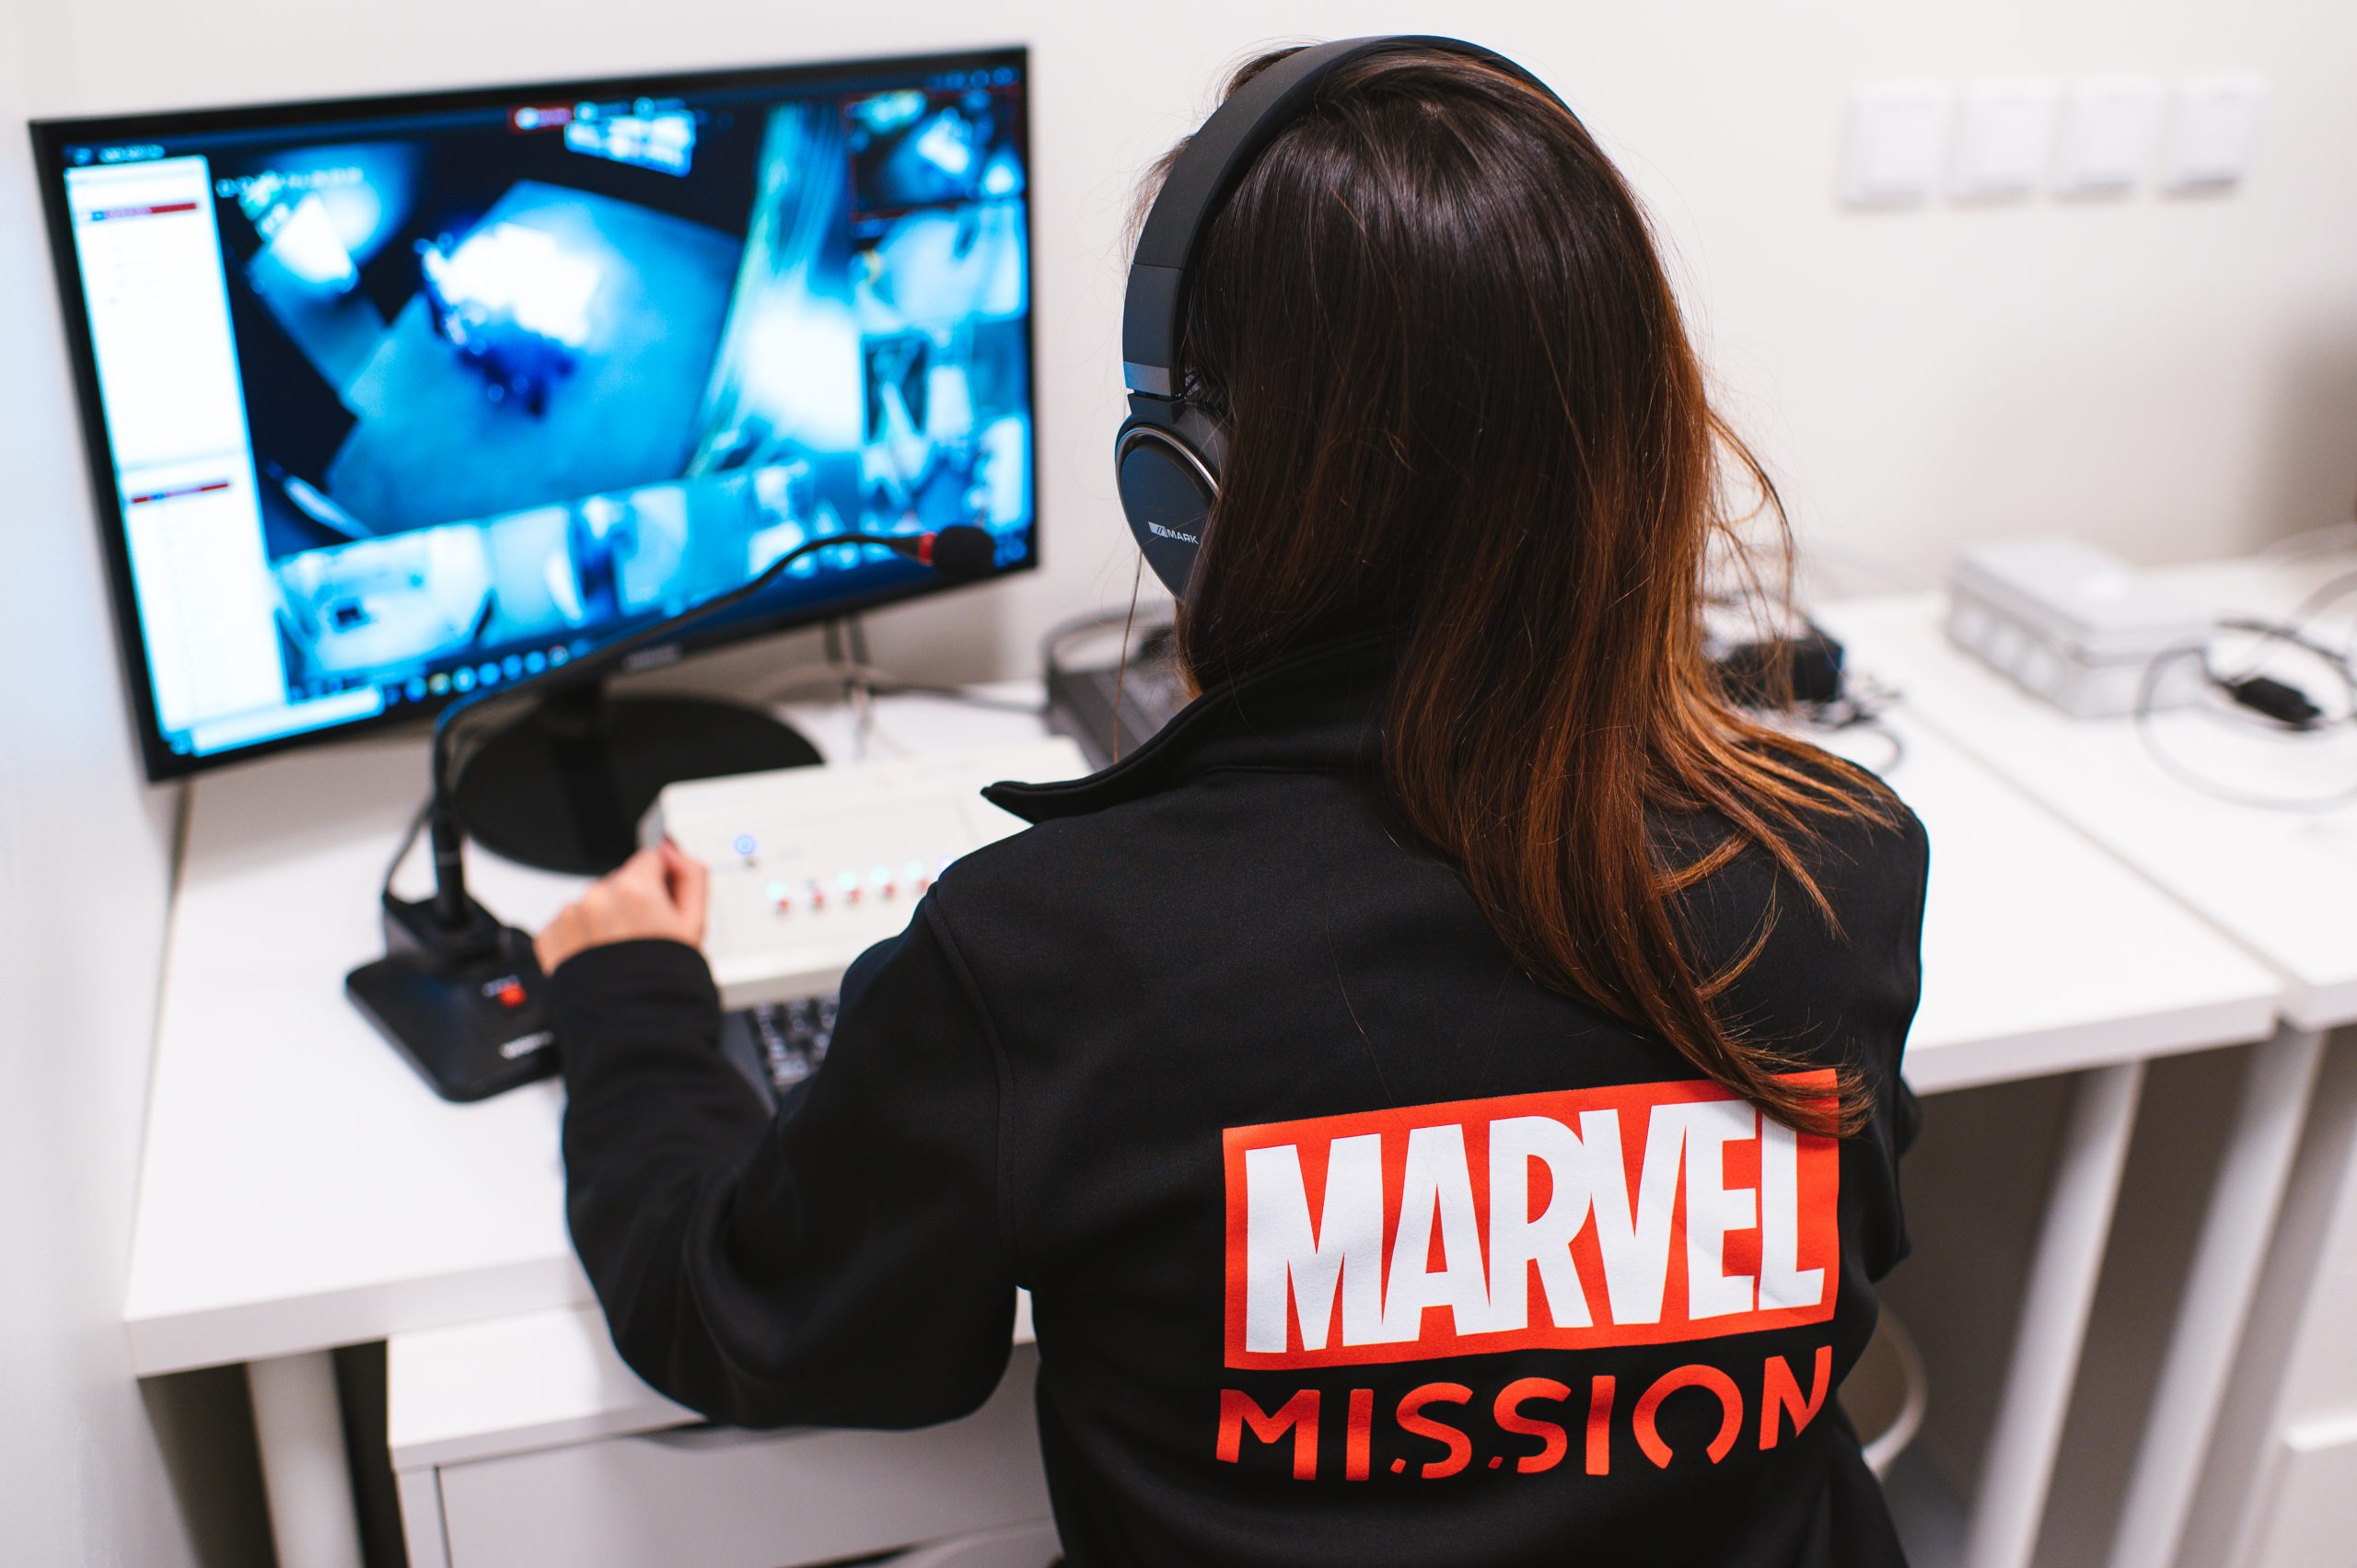 MARVEL MISSION – MARVEL